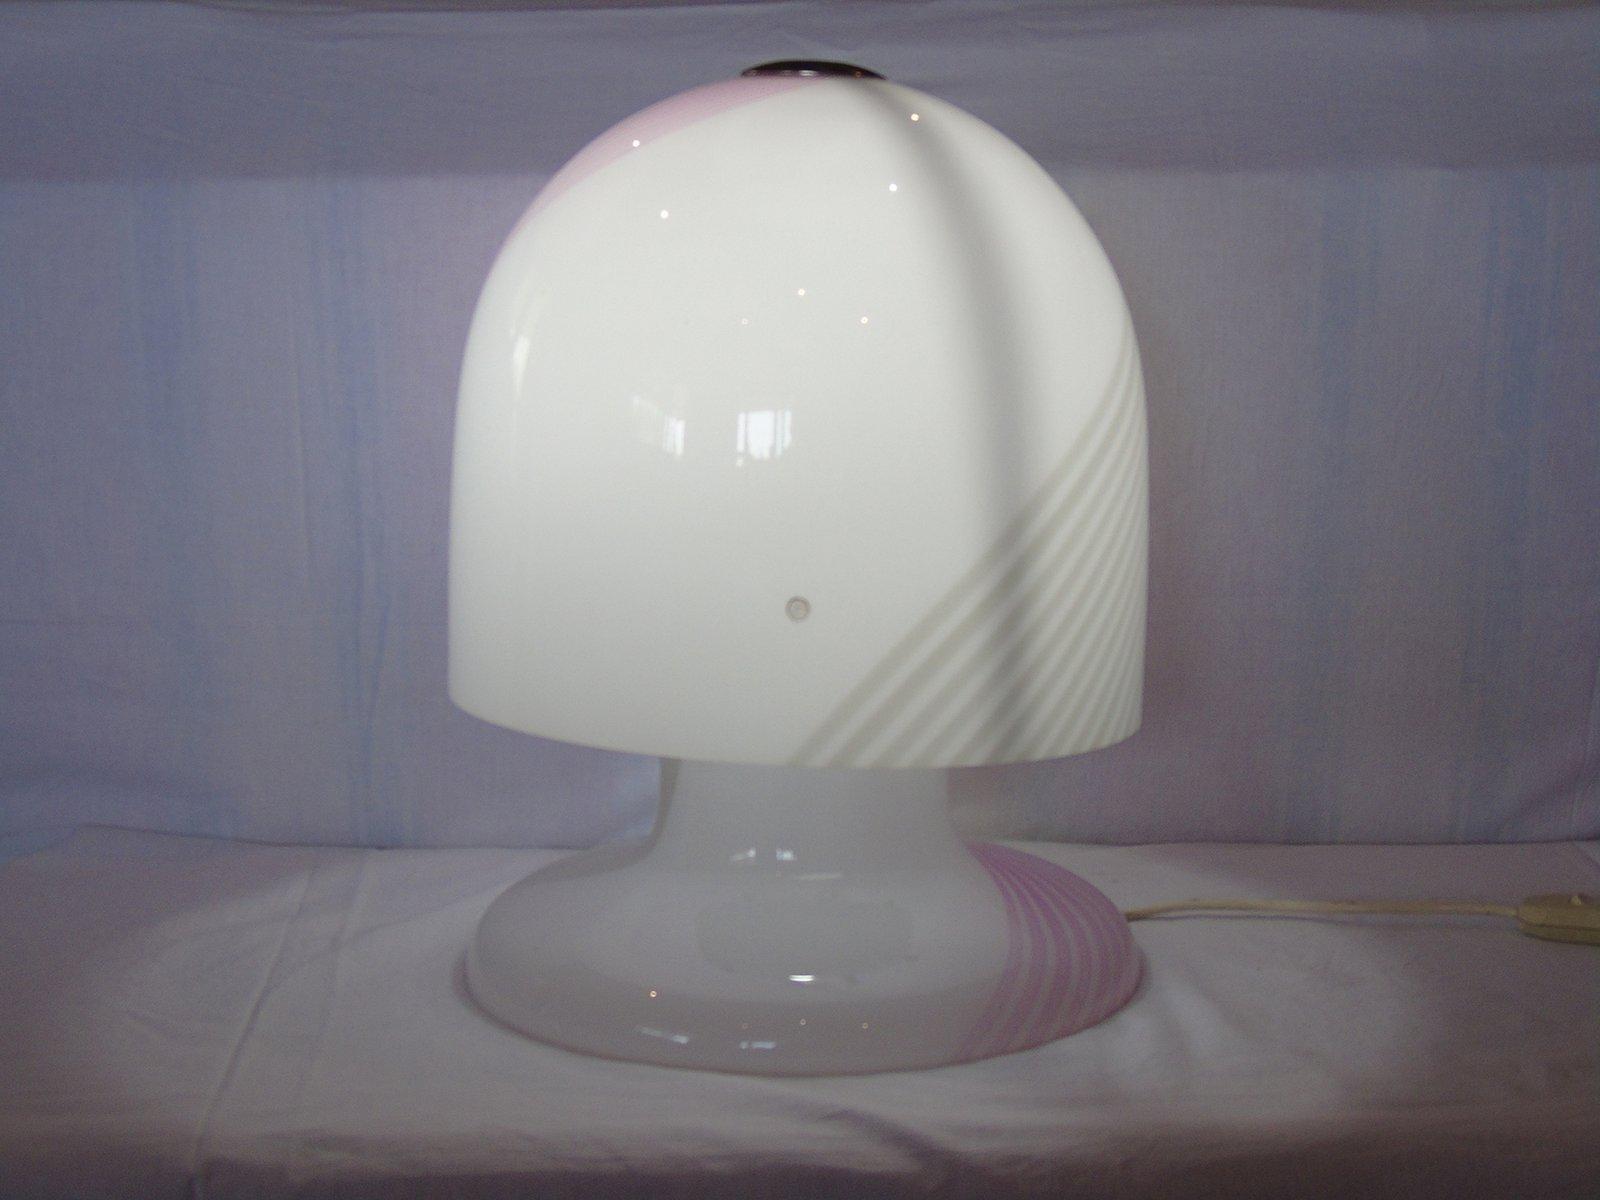 vintage murano glas mushroom lampe von la murrina bei pamono kaufen. Black Bedroom Furniture Sets. Home Design Ideas